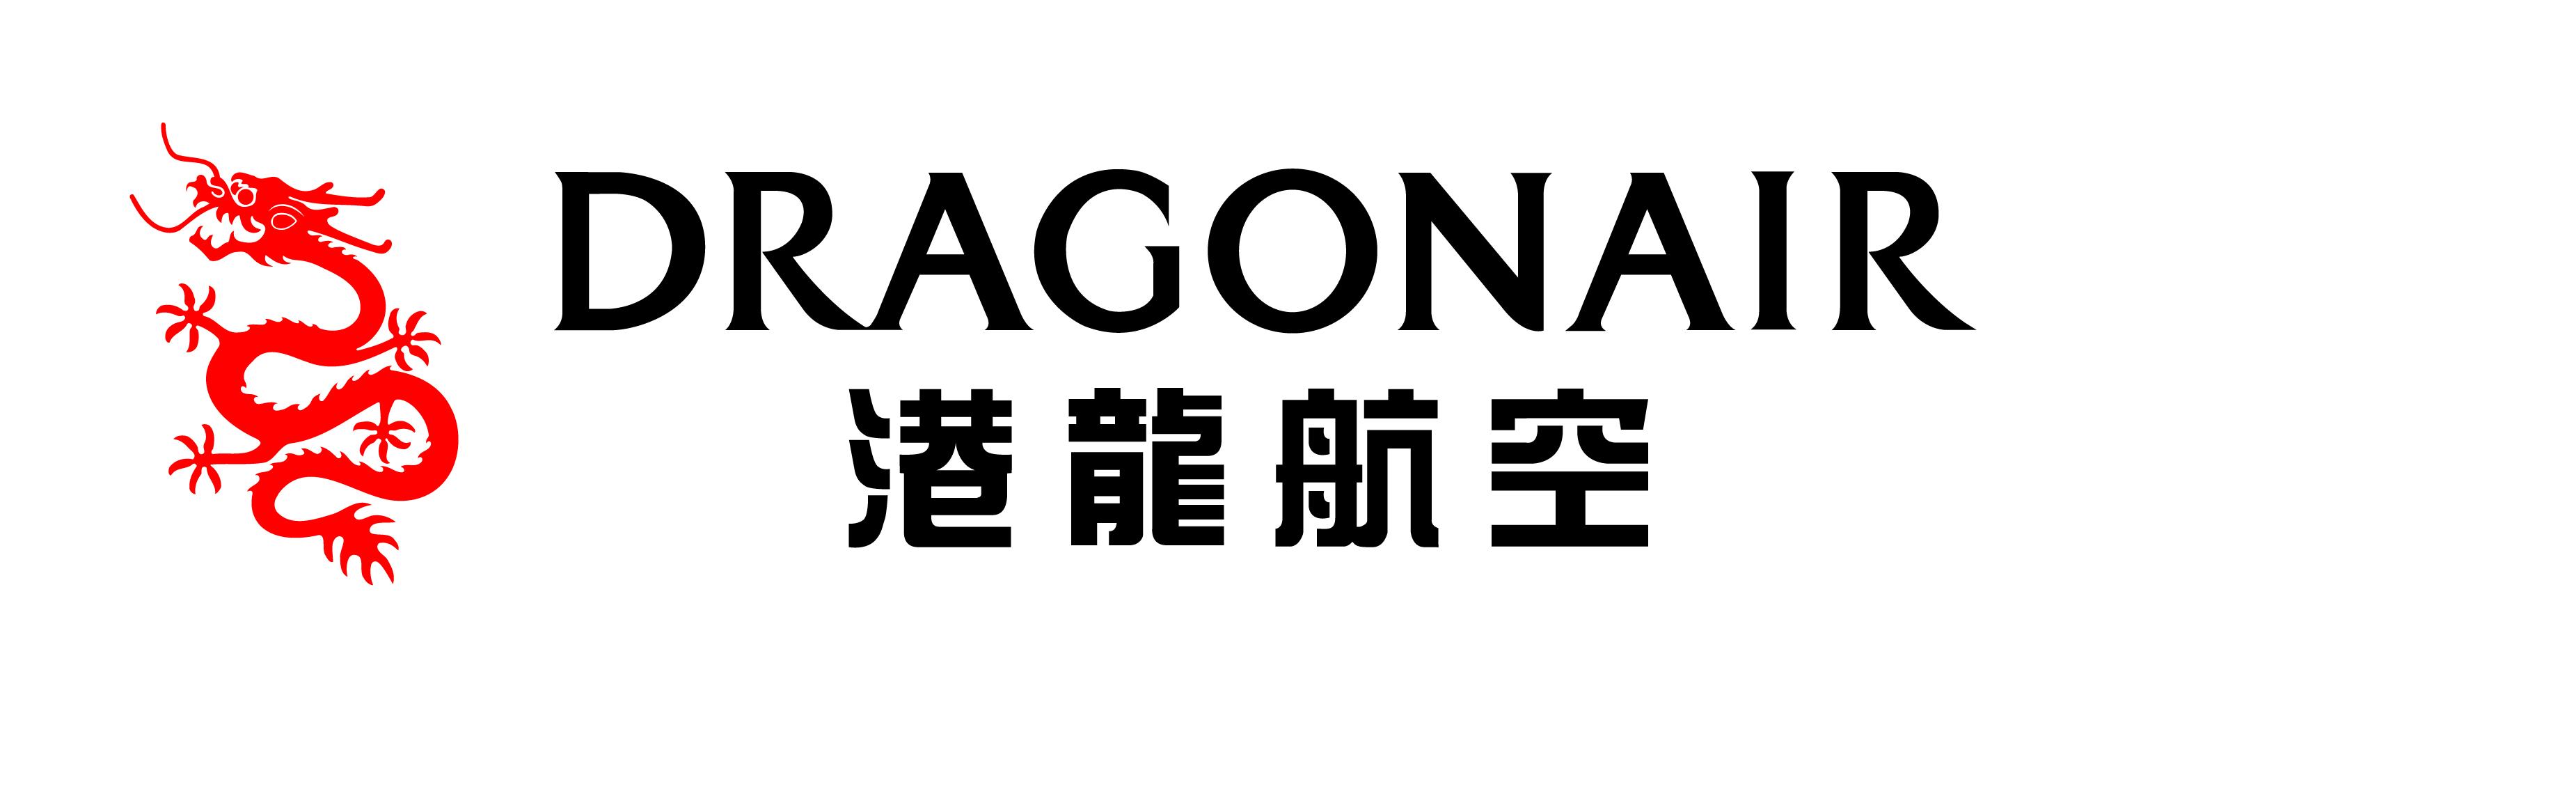 Dragonair Logo PNG - 101575